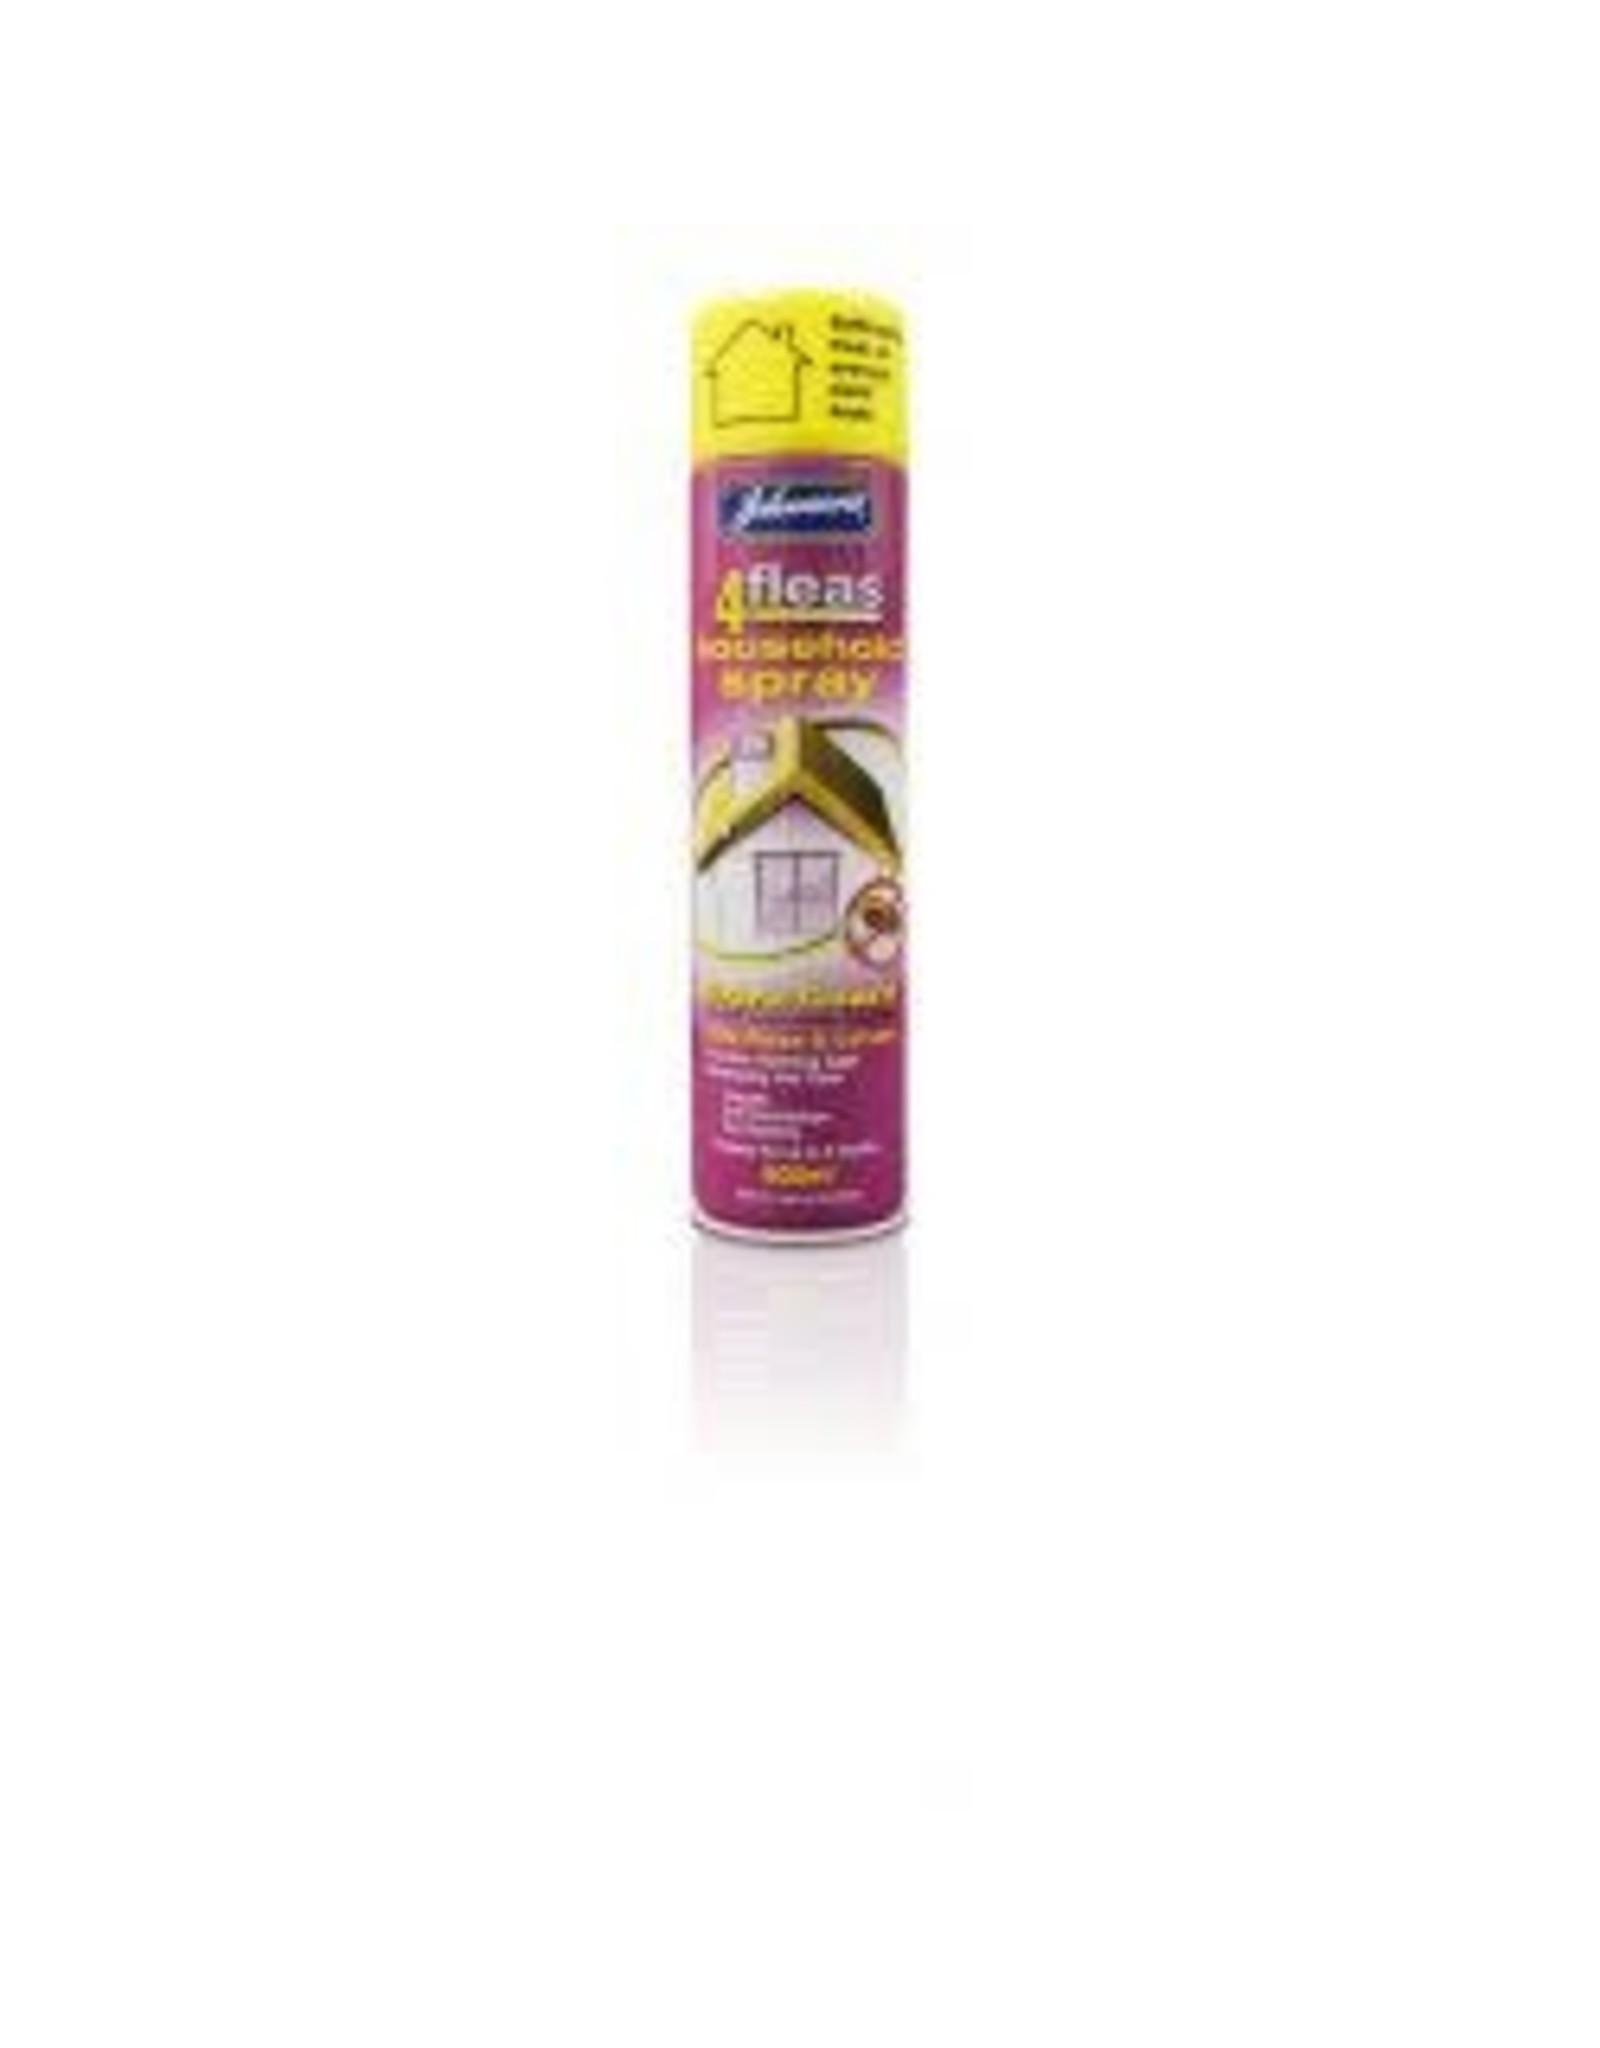 Johnsons Veterinary Products Johnsons 4Fleas Household Flea Spray 600ml